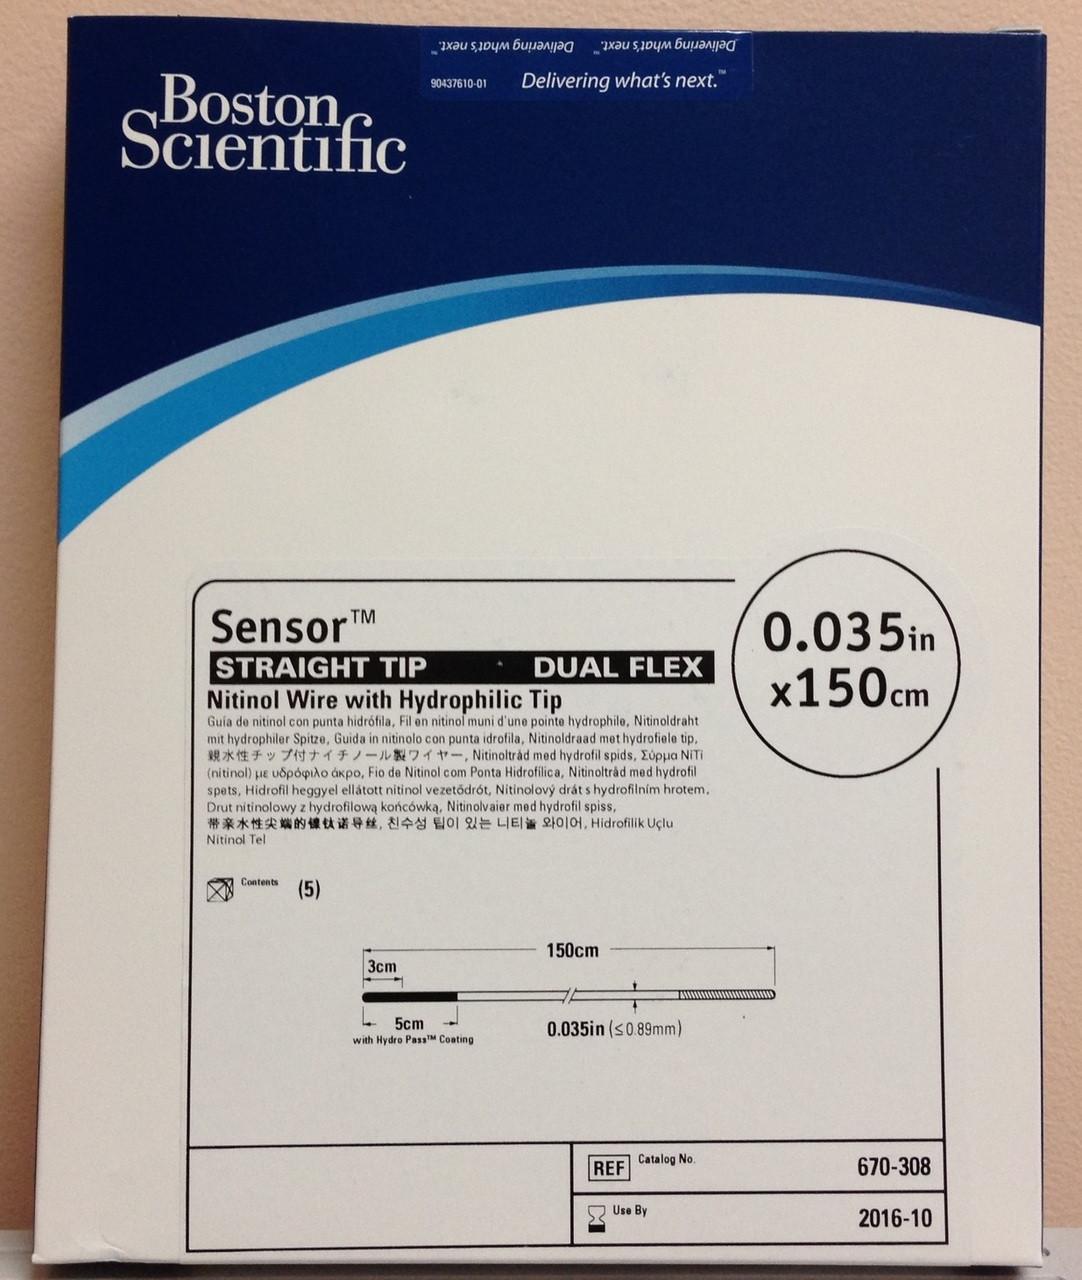 "Boston scientific, 670-305, 0. 035"", boston scientific sensor."